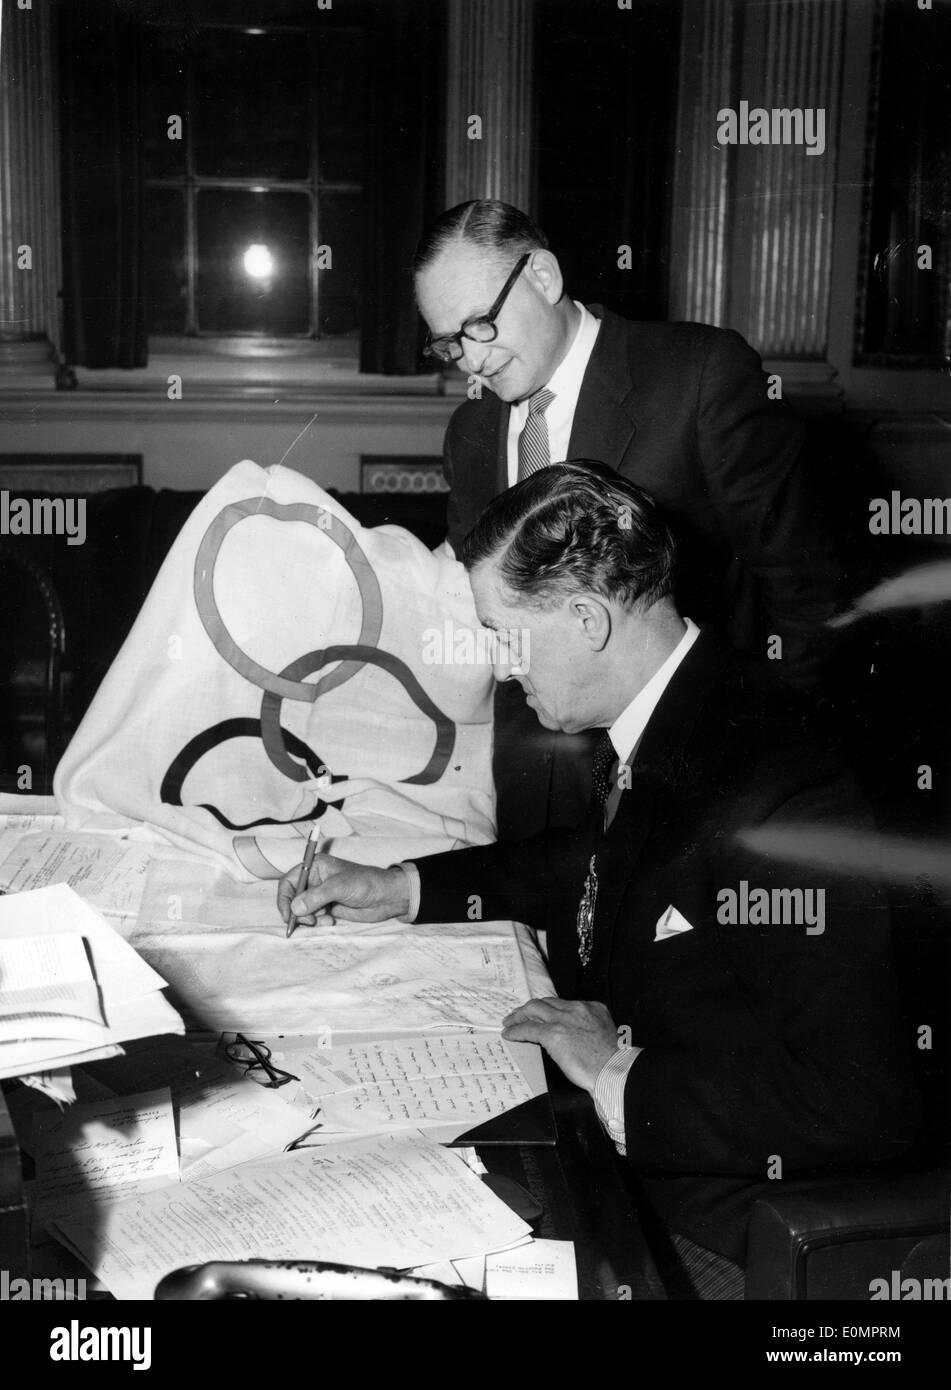 Paul Morawetz has Lord Ackroyd sign Olympic flag - Stock Image